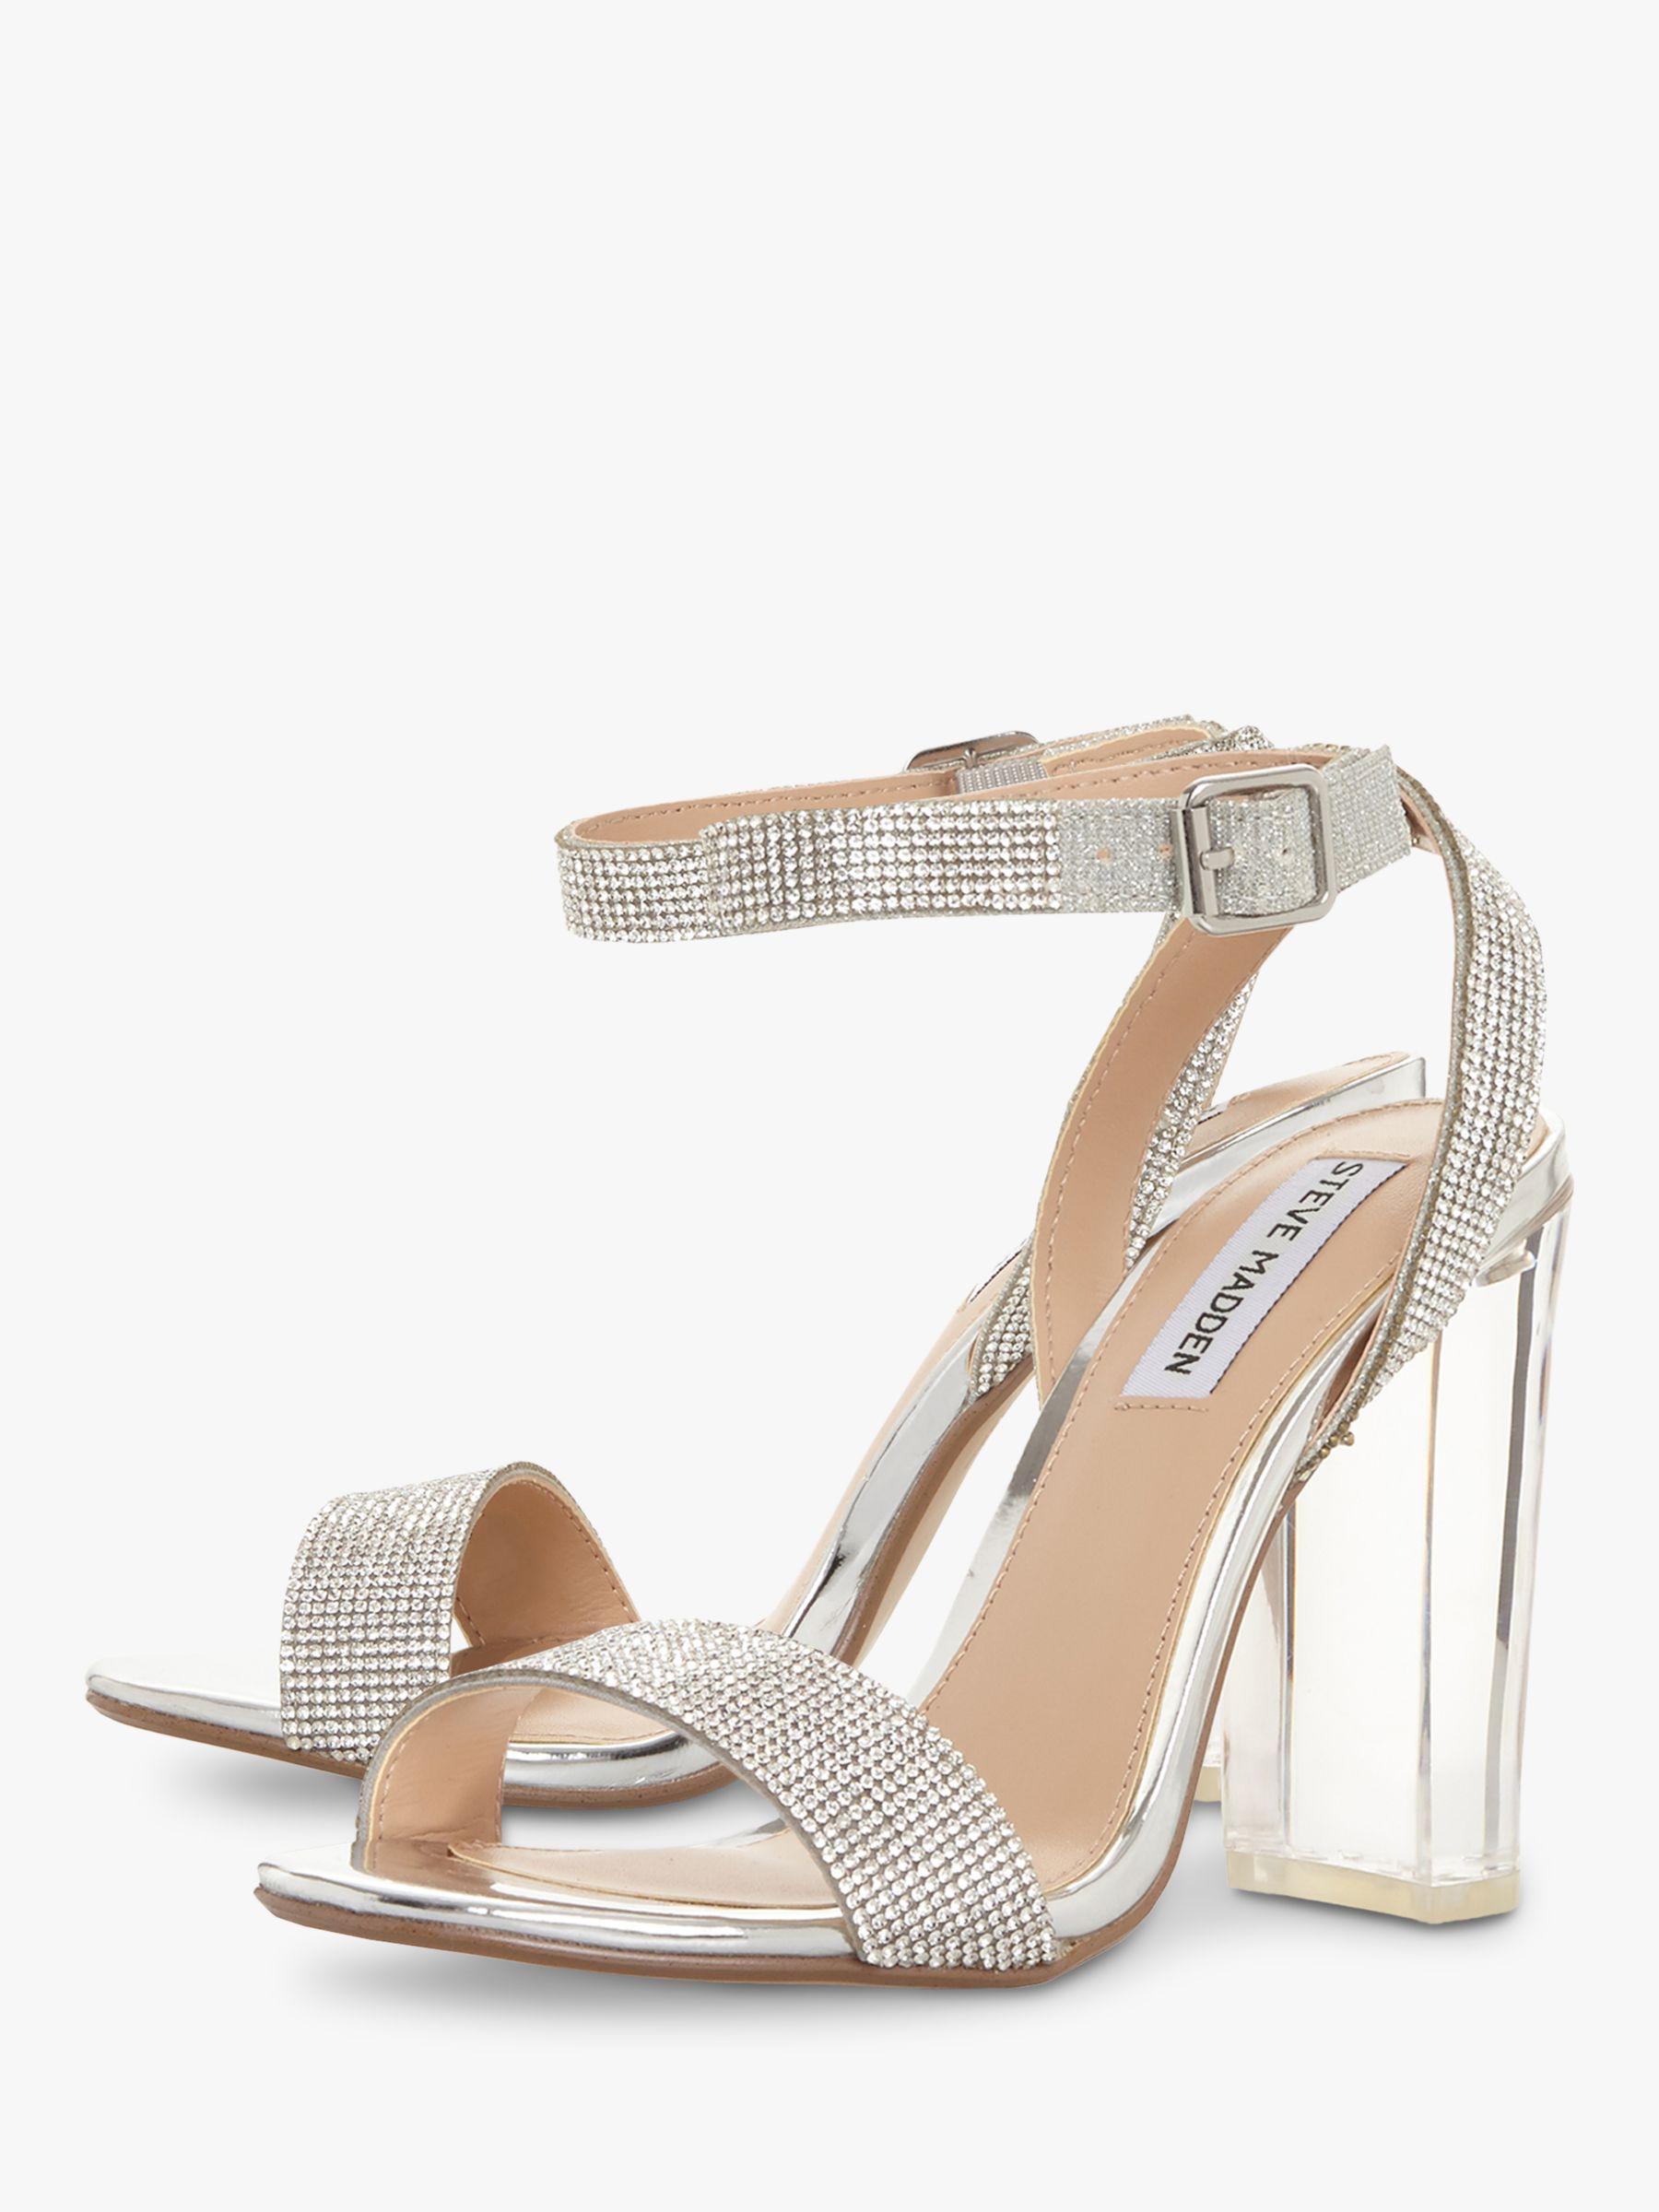 5a172f47f57 Steve Madden Crysler Crystal High Block Heel Sandals in Metallic - Lyst